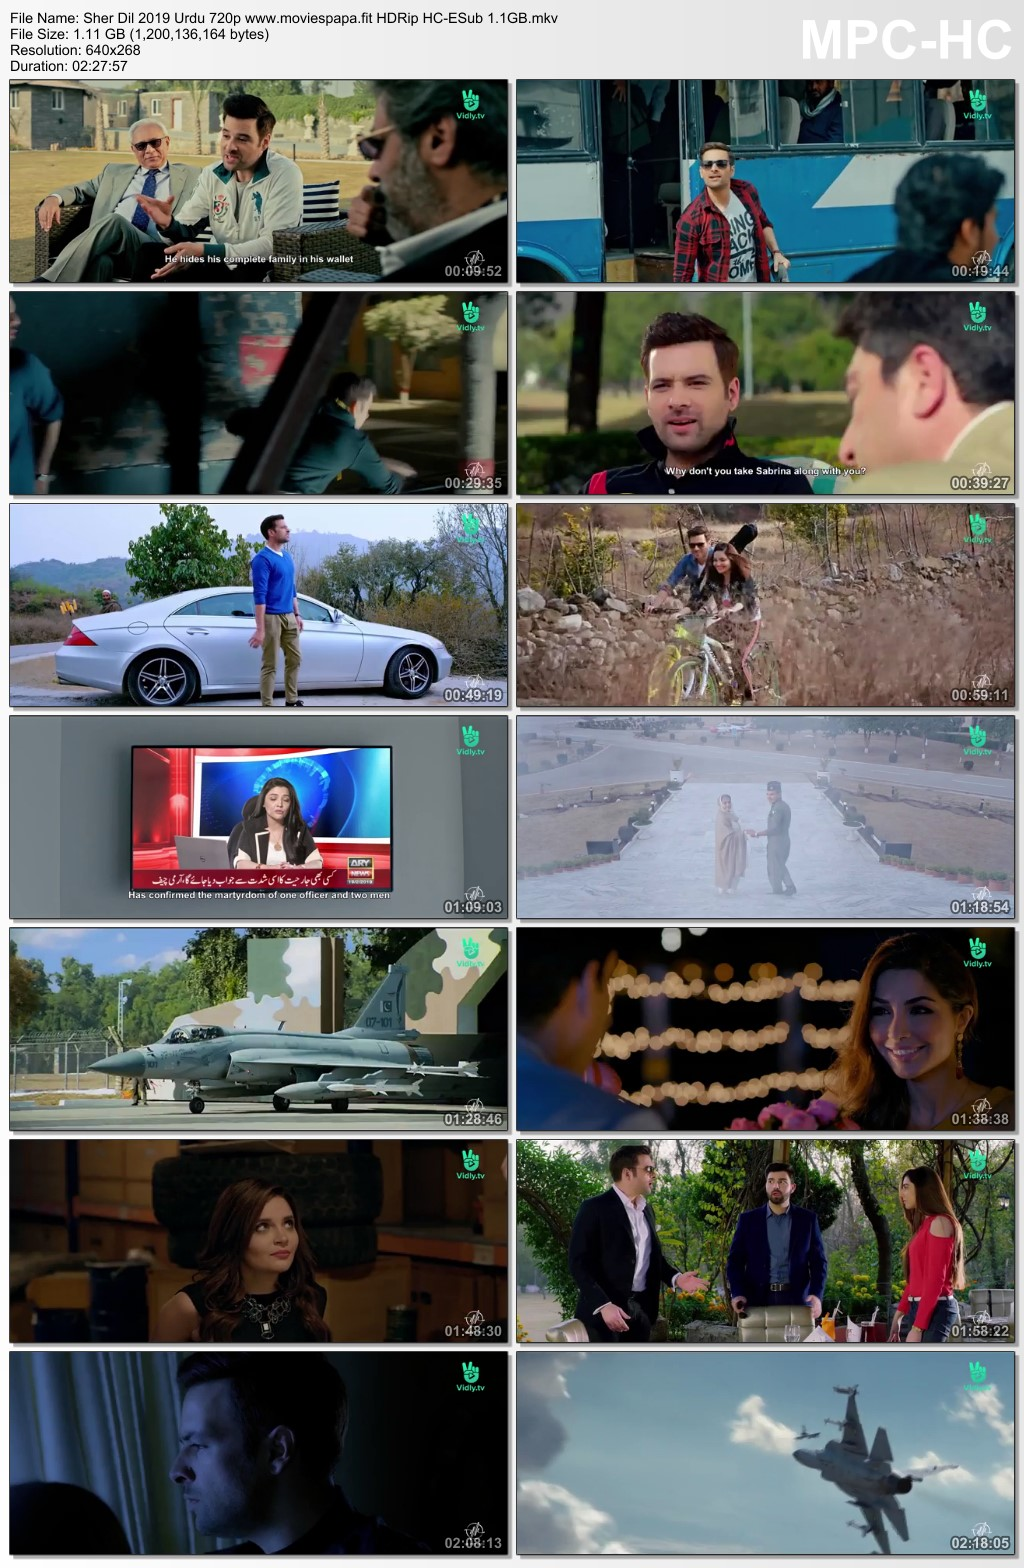 Sher Dil 2019 Urdu 720p Hdrip Hc Esub 1 1gb Download Moviespapa Top